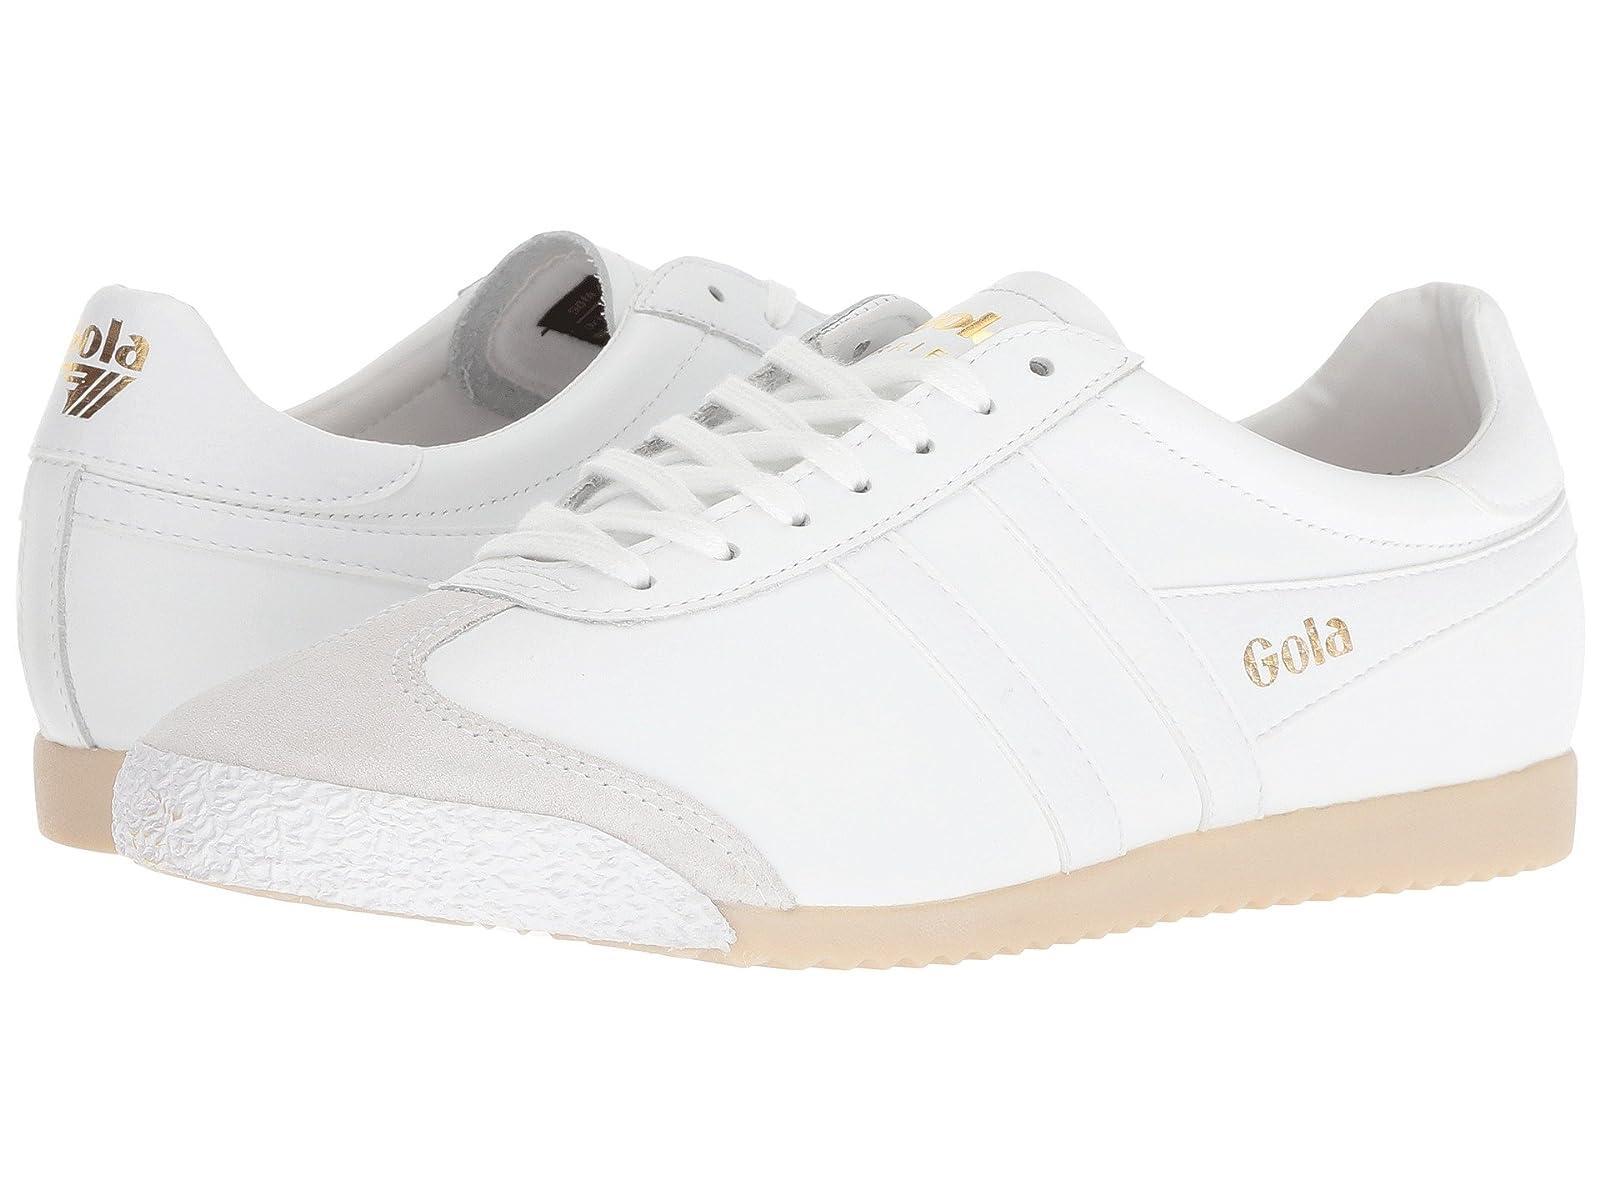 Gola Harrier 50 LeatherAtmospheric grades have affordable shoes